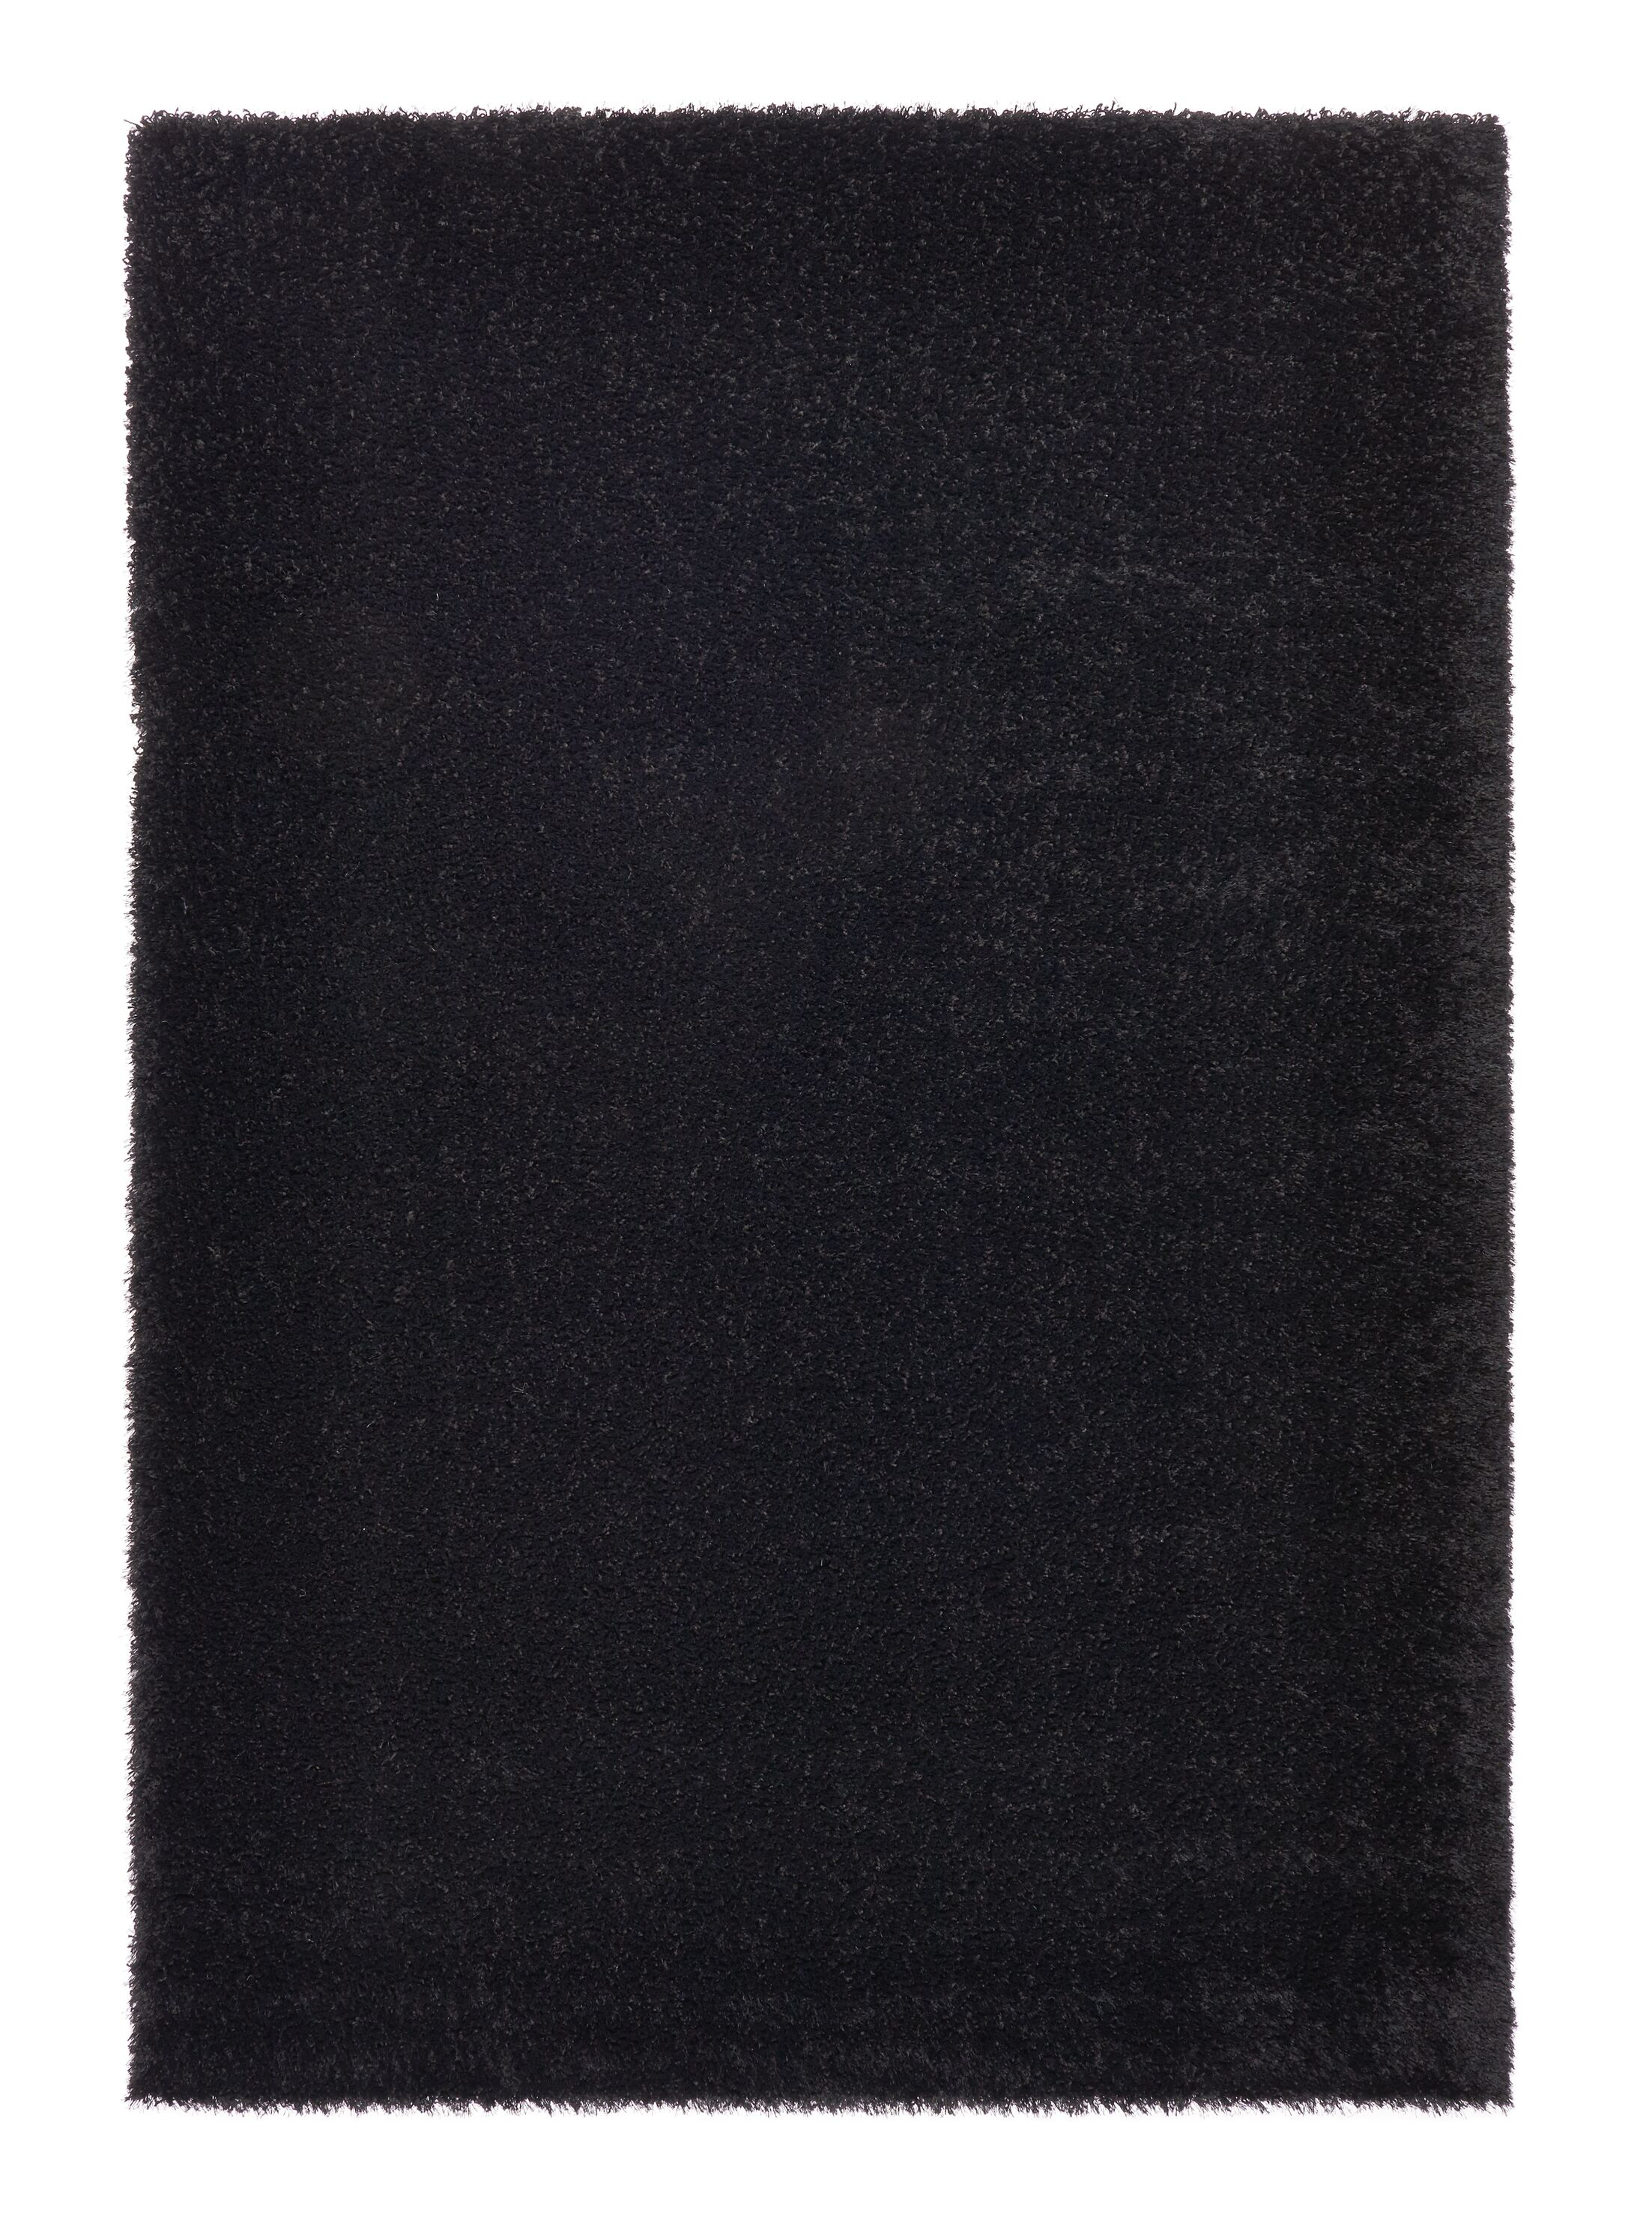 Ocean Black Area Rug Rug Size: 5'3